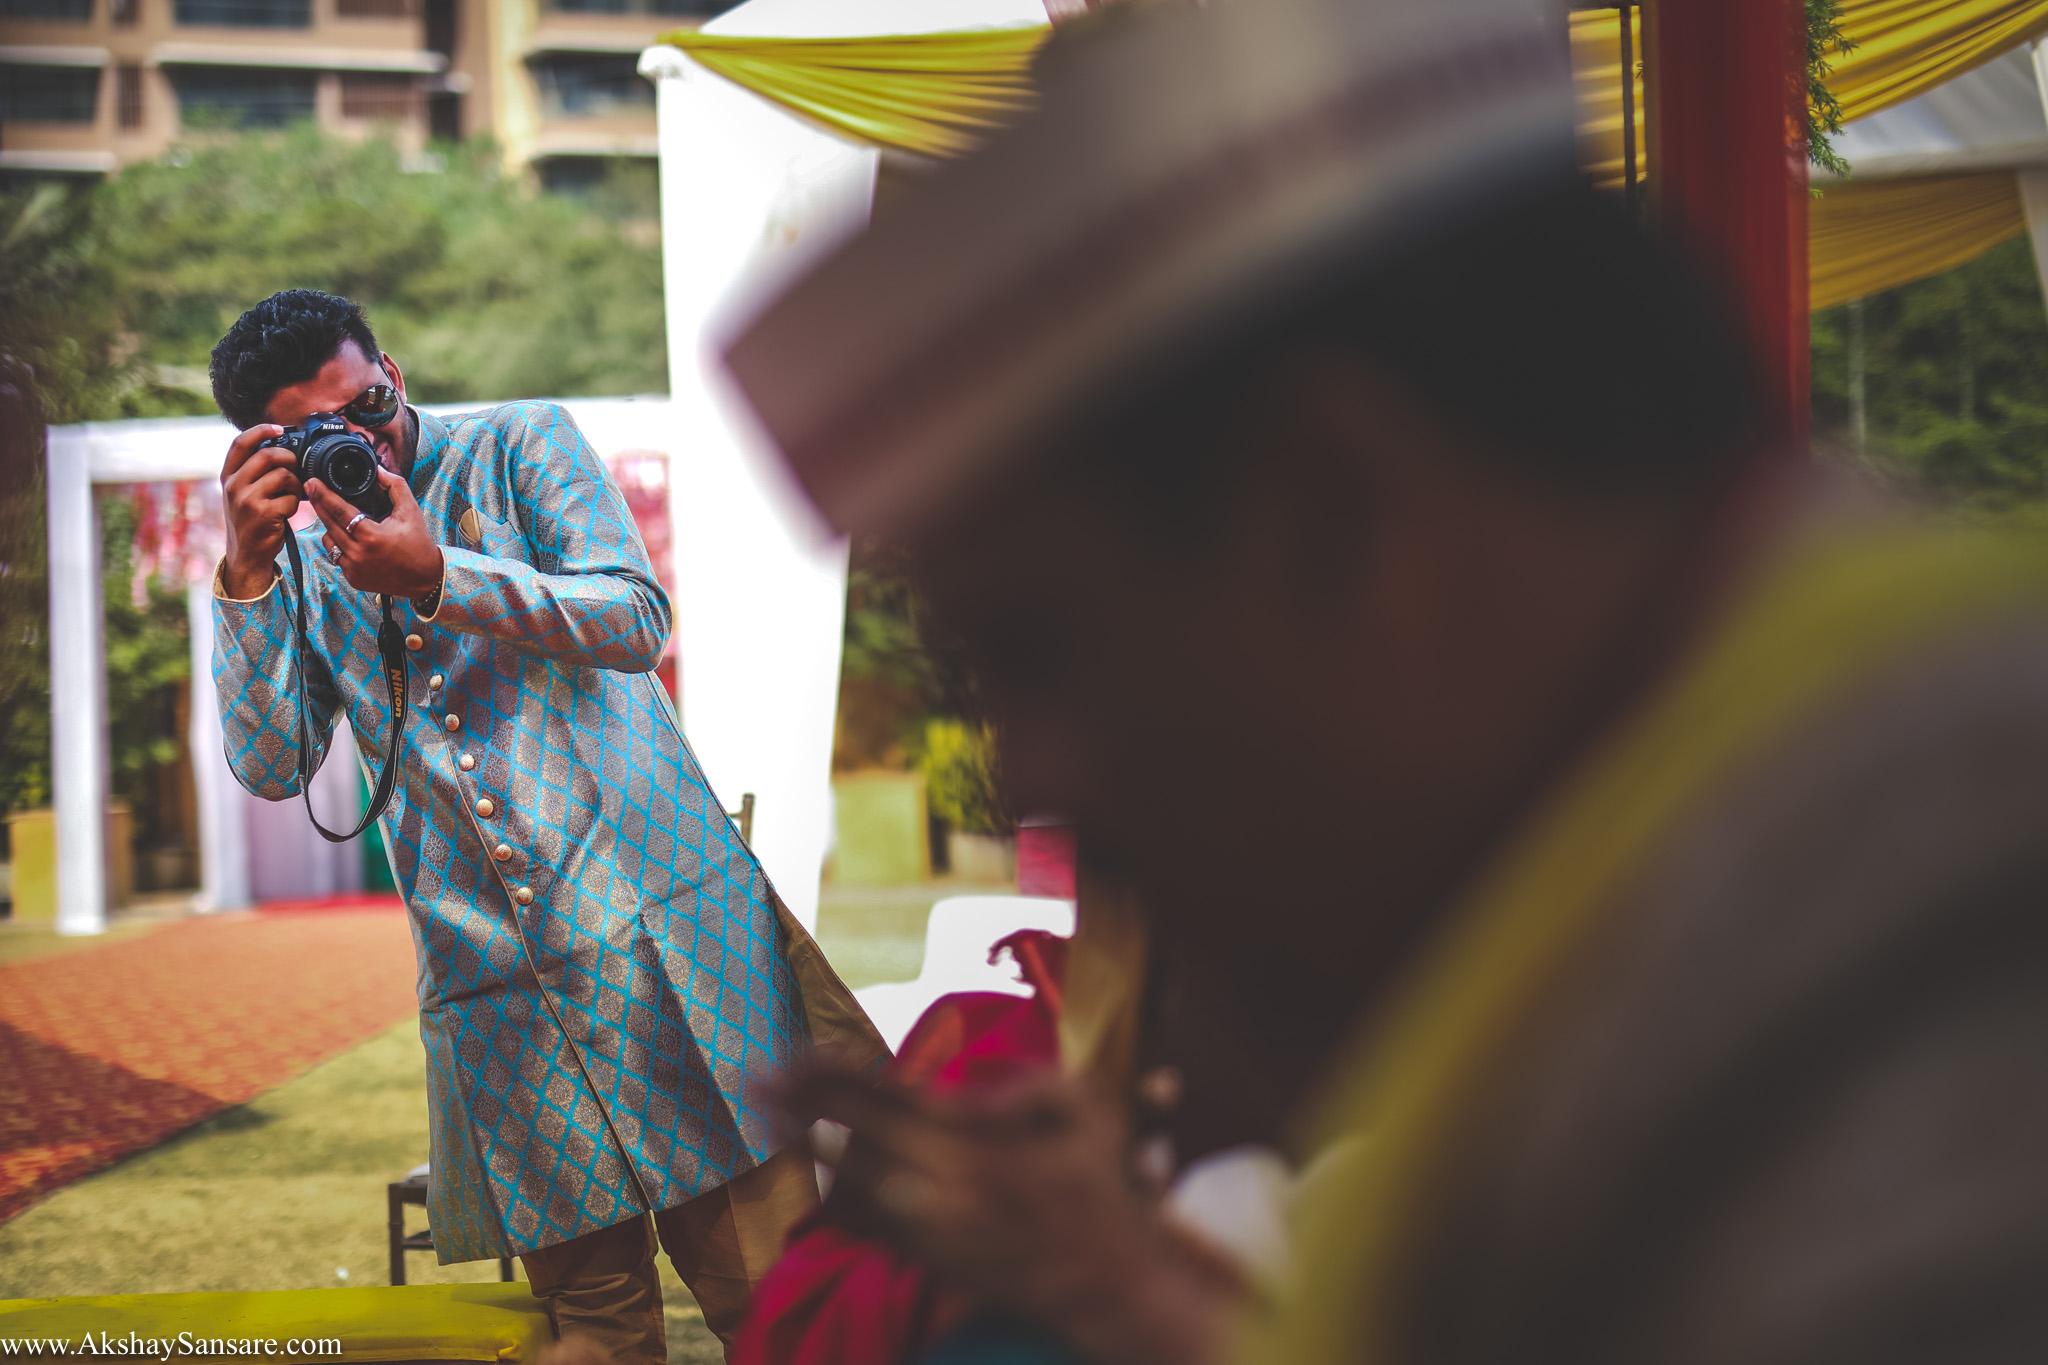 Salil x Kimaya Akshay Sansare Photography Candid wedding Photographer in mumbai best(13).jpg